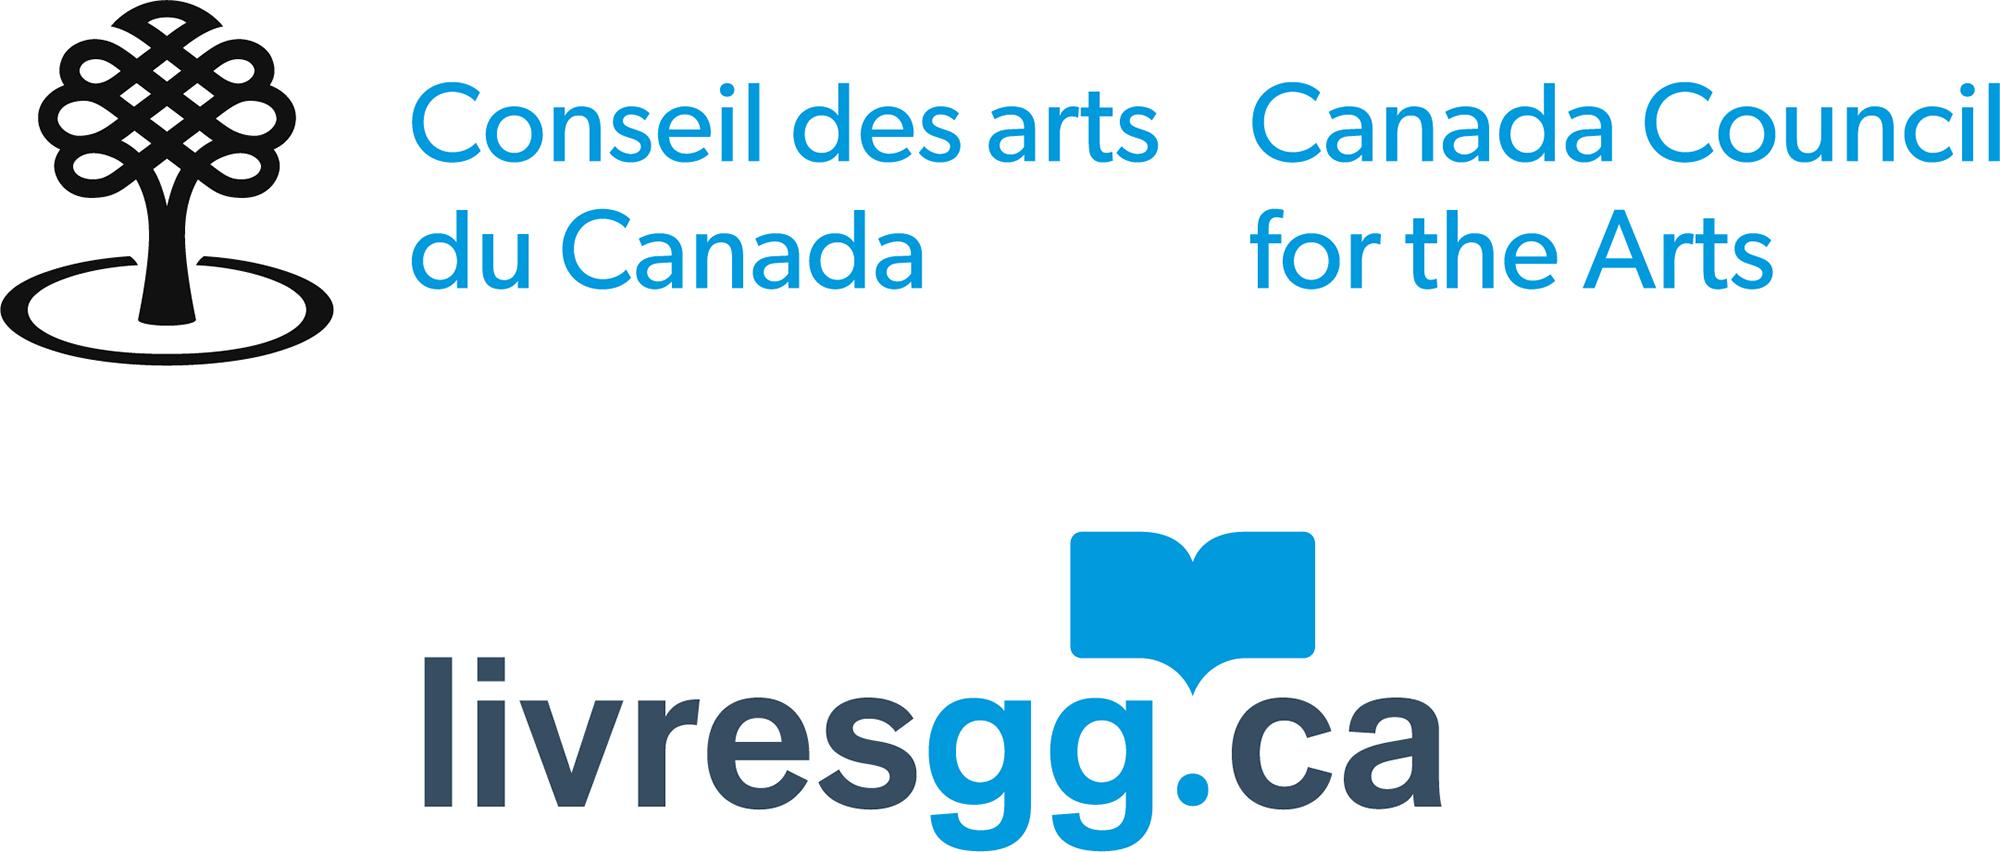 Canada Council for the Arts logo for livresgg.ca